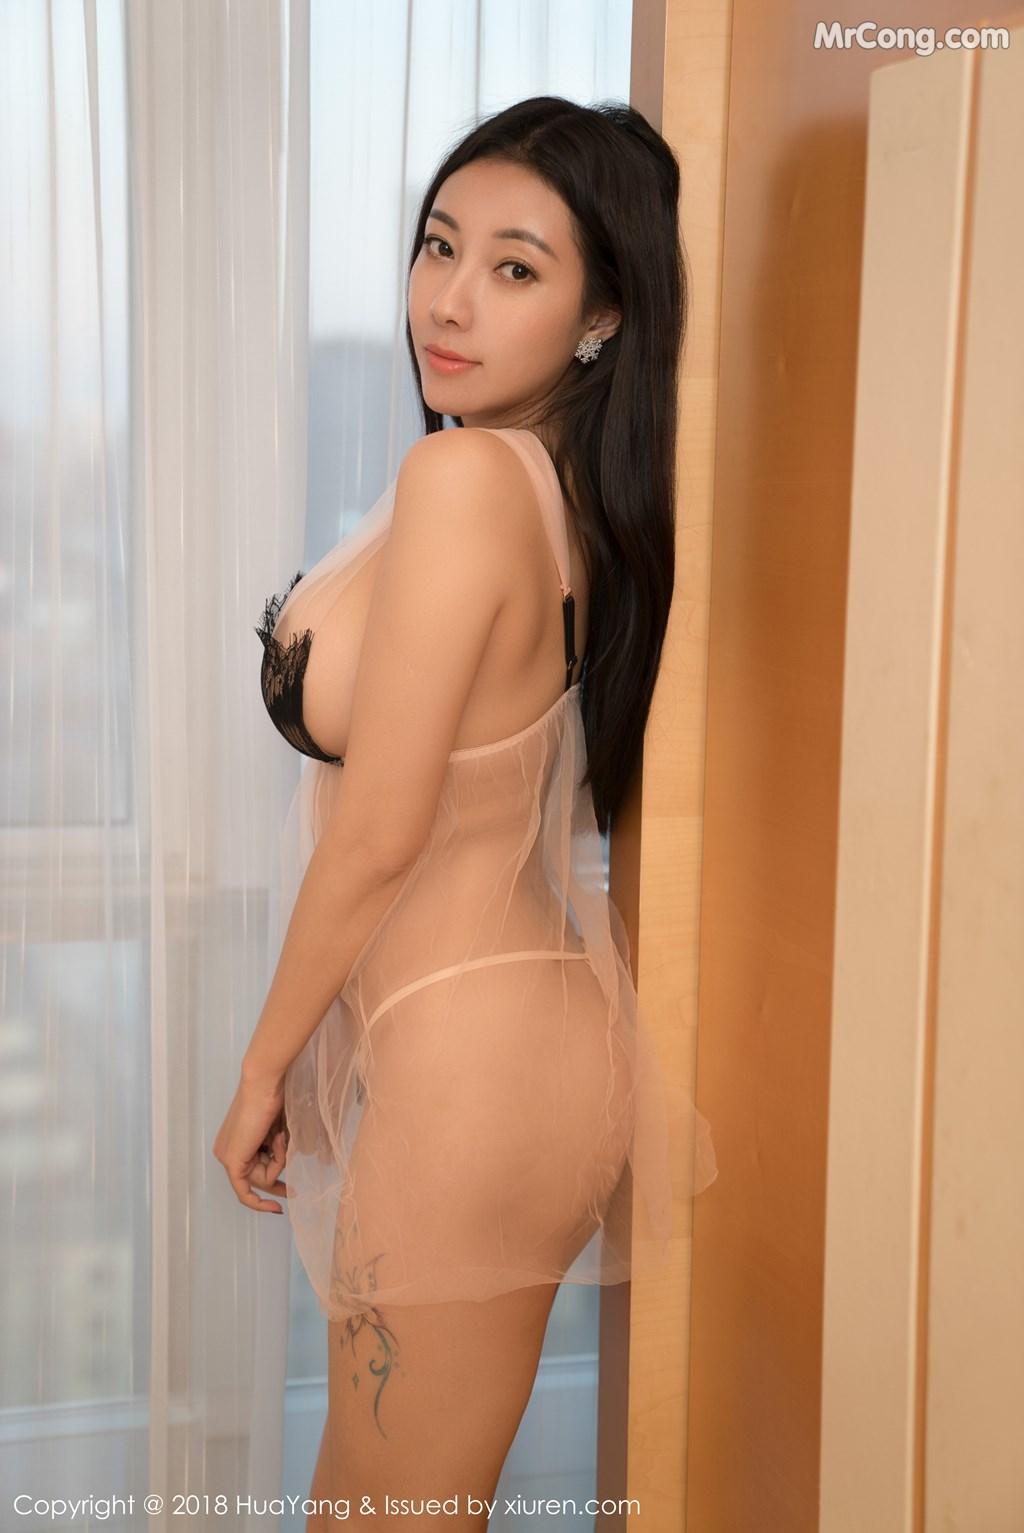 Image HuaYang-2018-01-26-Vol.028-Victoria-Guo-Er-MrCong.com-001 in post HuaYang 2018-01-26 Vol.028: Người mẫu Victoria (果儿) (41 ảnh)